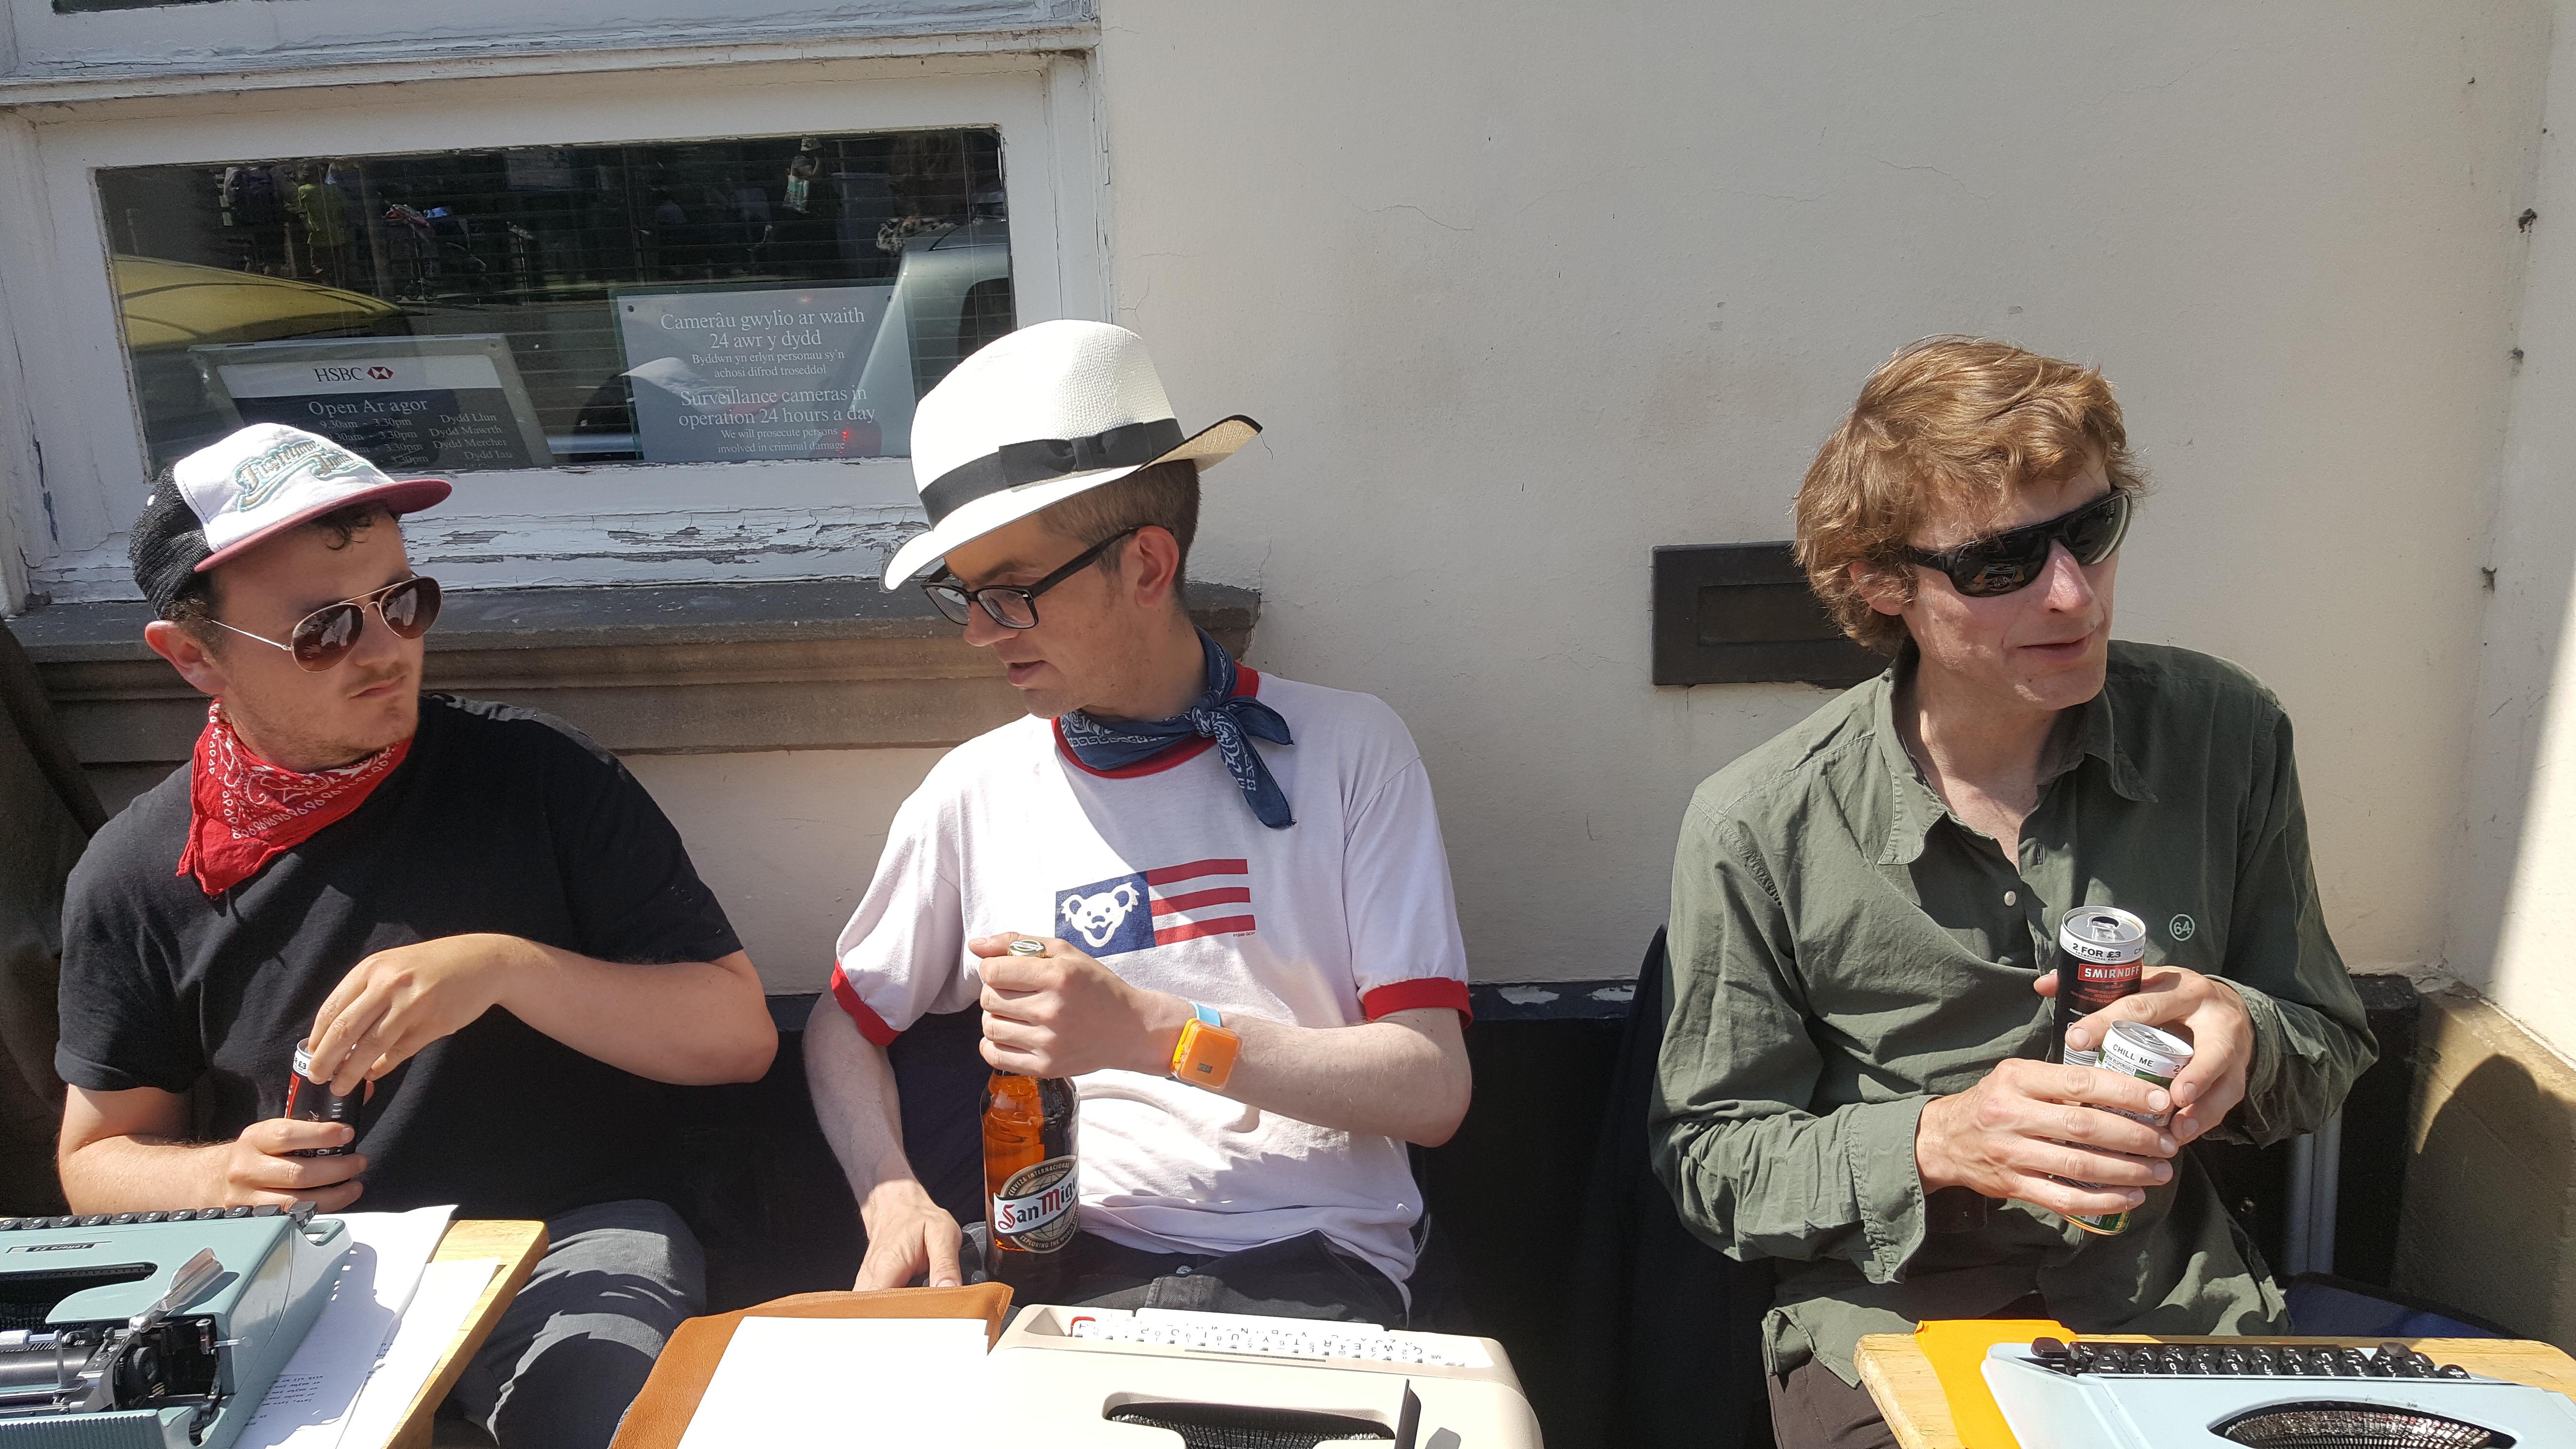 three sidewalk poets at Hay-on-Wye